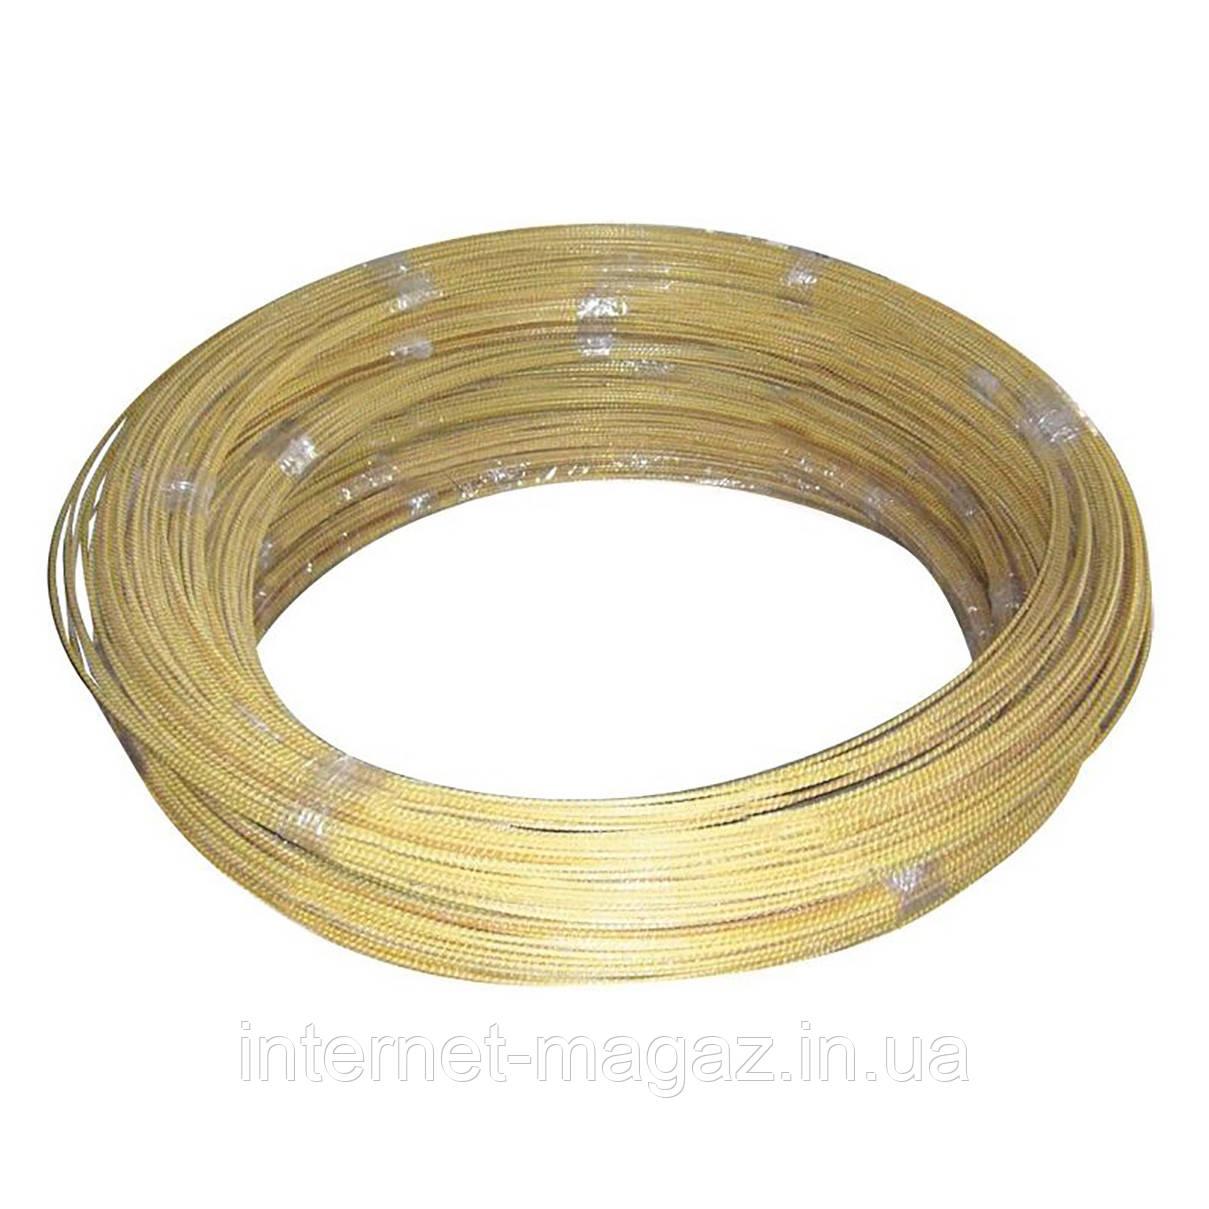 Арматура композитная стеклопластикова ЛЕГО 7 мм